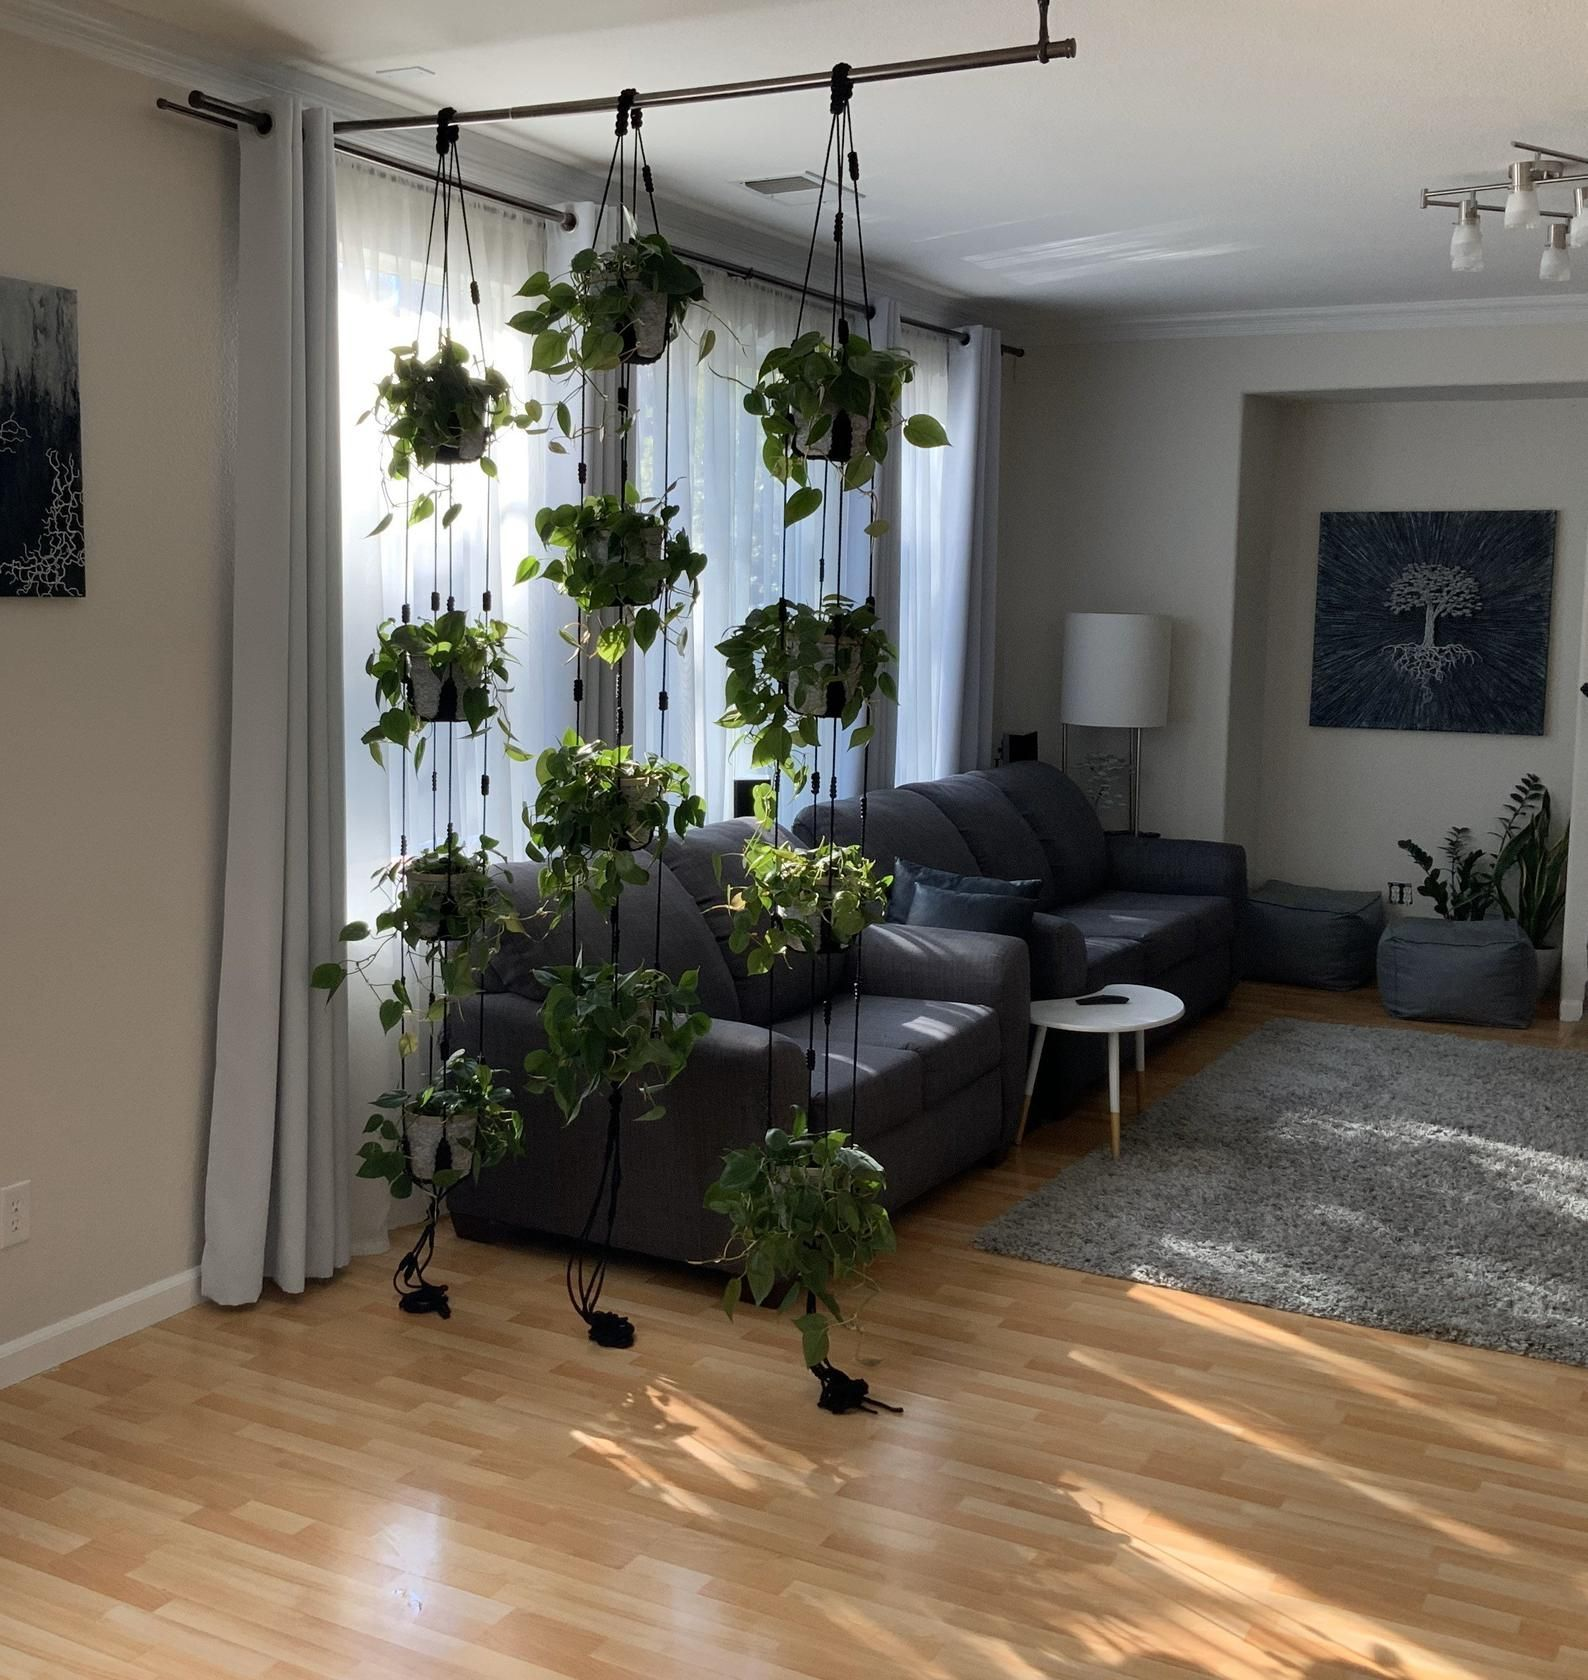 Adjustable plant hanger, multiple plants display, room